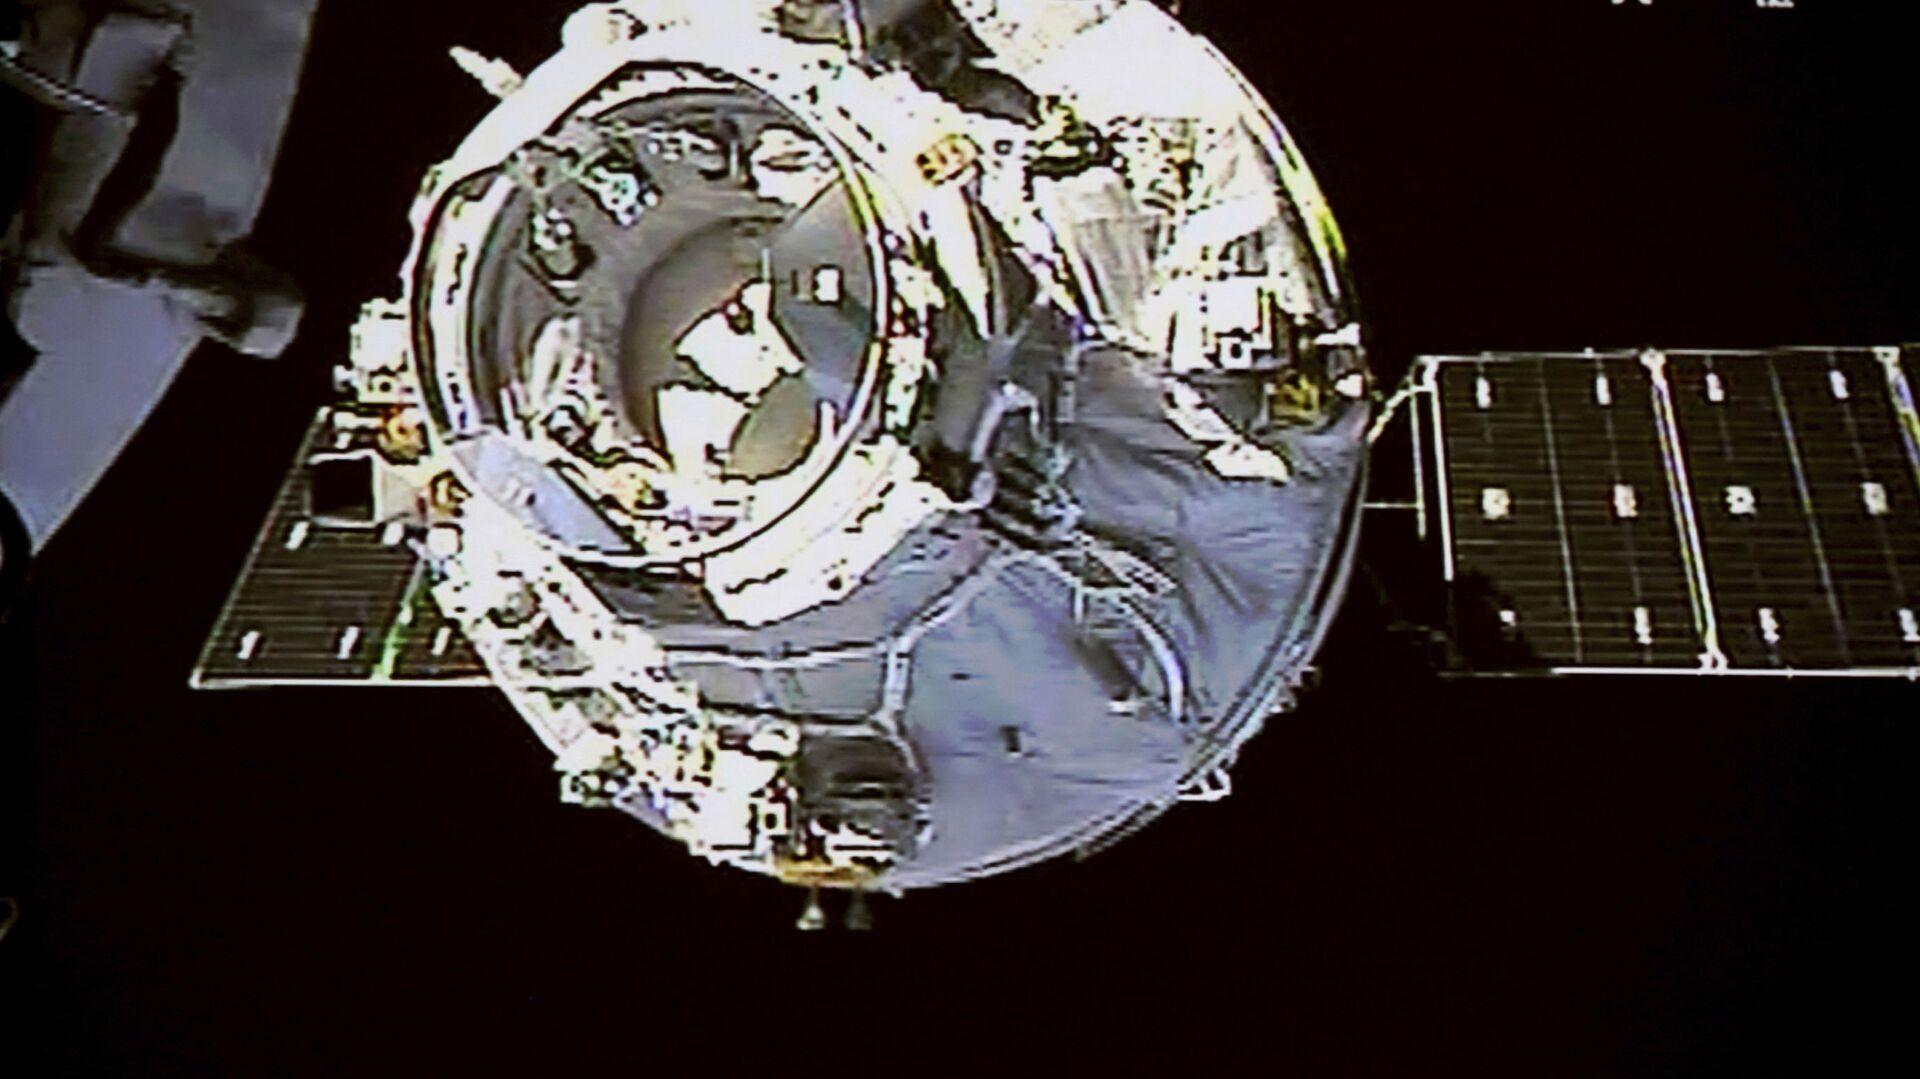 La stazione spaziale cinese Tiangong-1 - Sputnik Italia, 1920, 17.09.2021